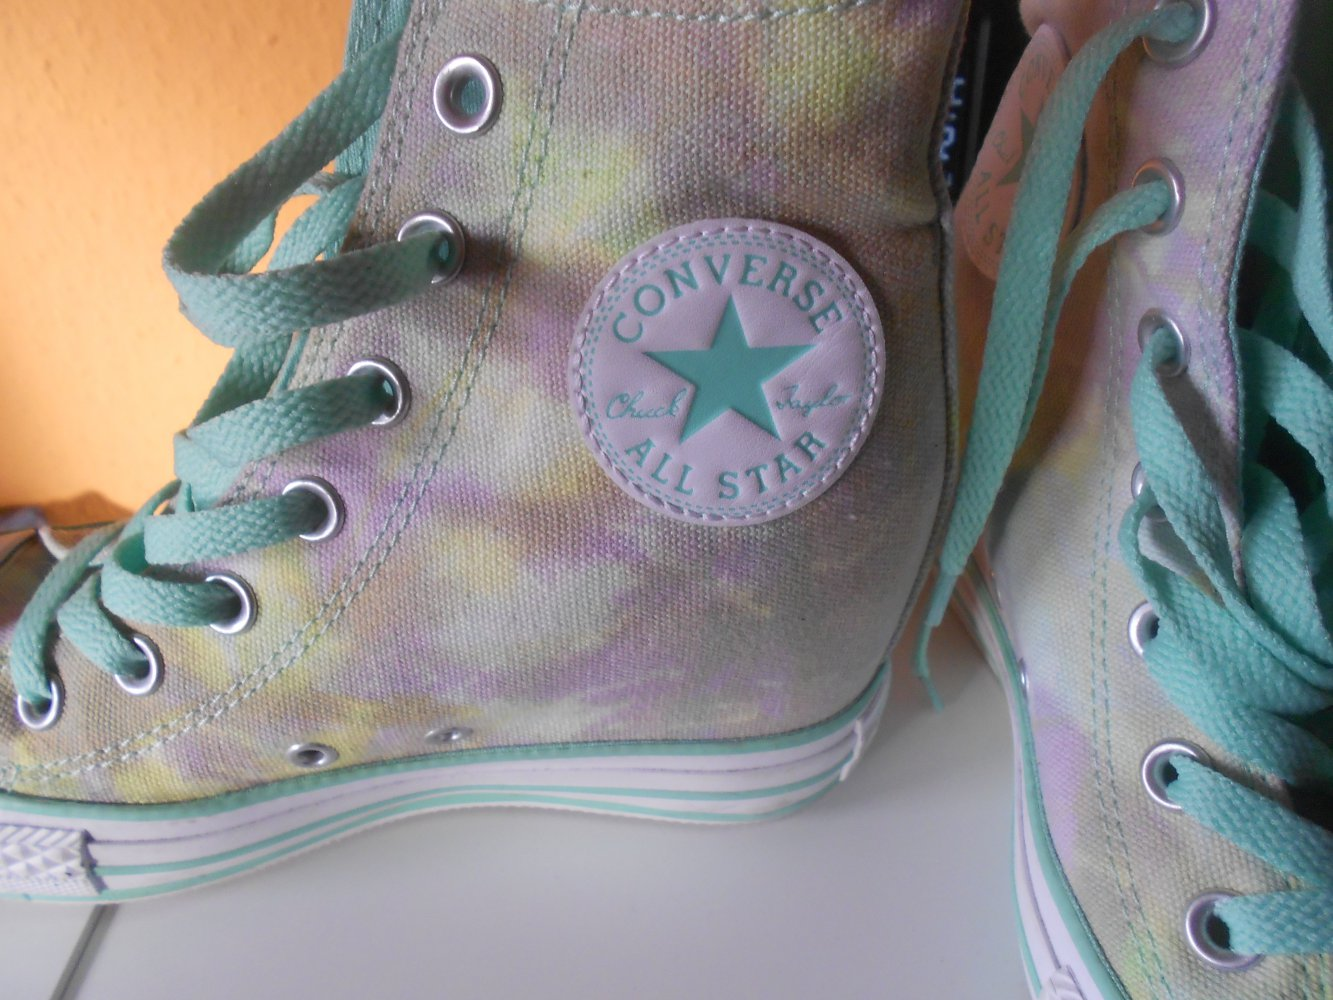 Converse All Star bunte Chucks Gr. 6 12 (37)